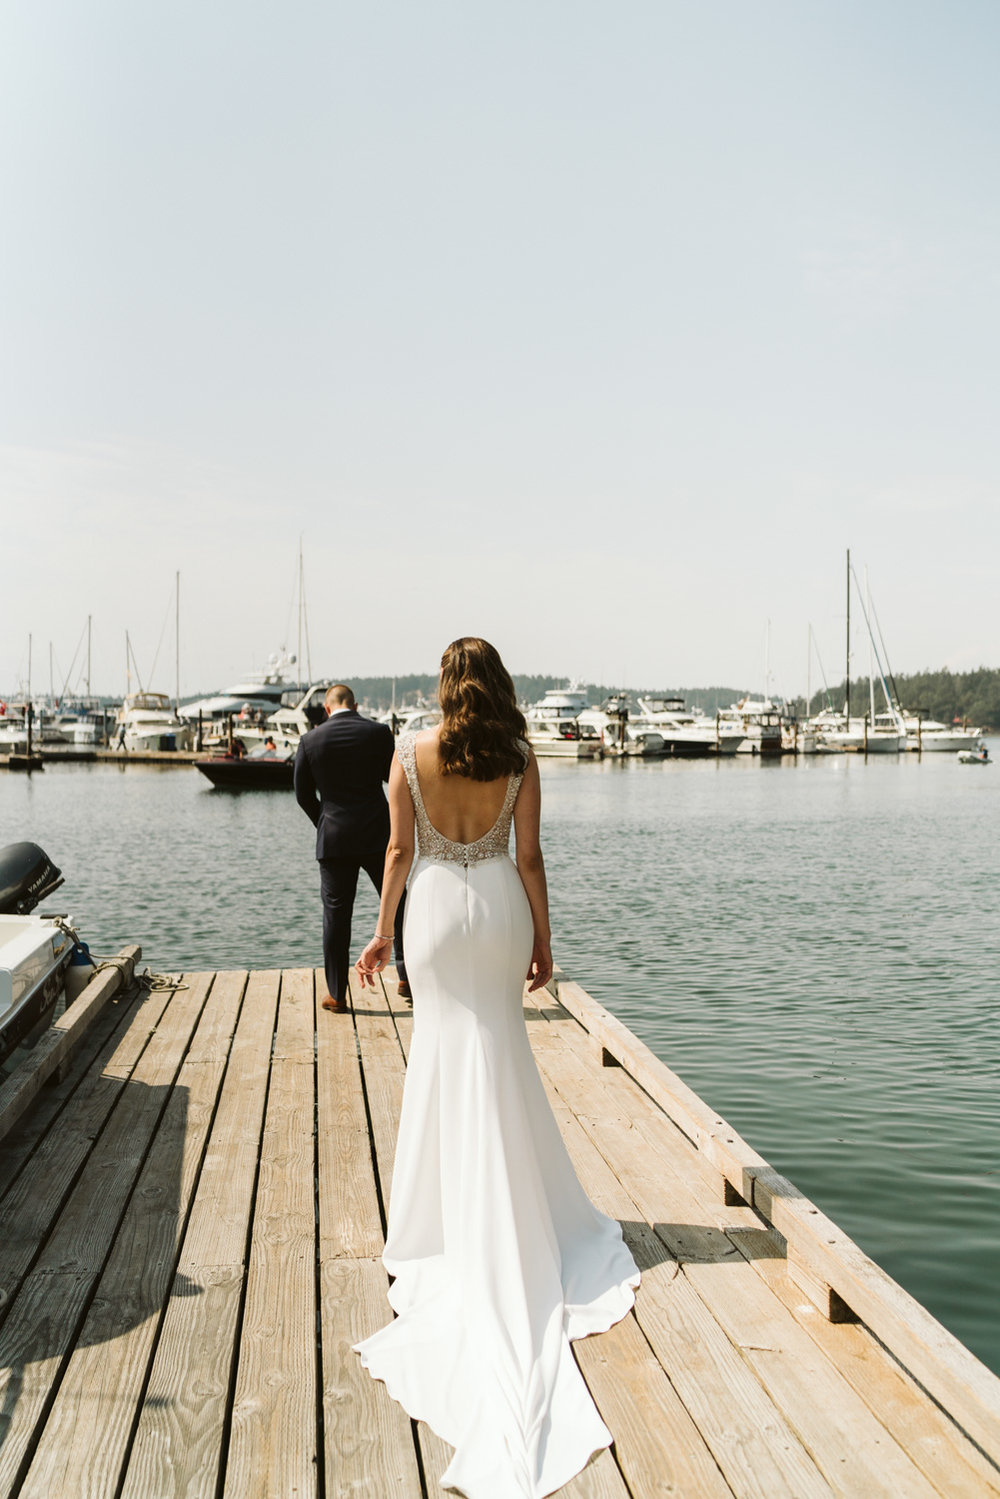 April Yentas Photography - Taisa & Kyle slideshow-23.jpg